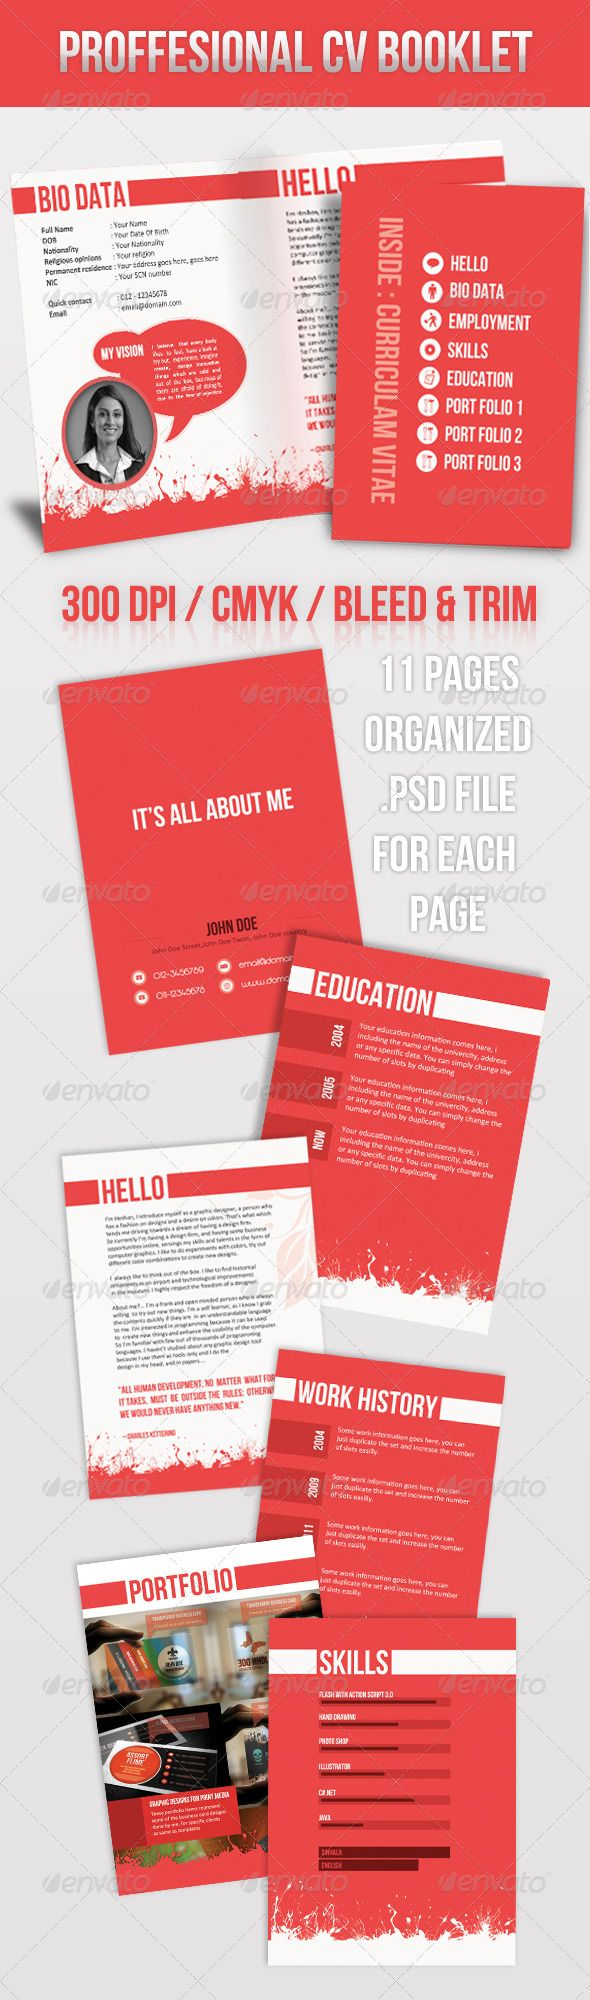 brochure style resume